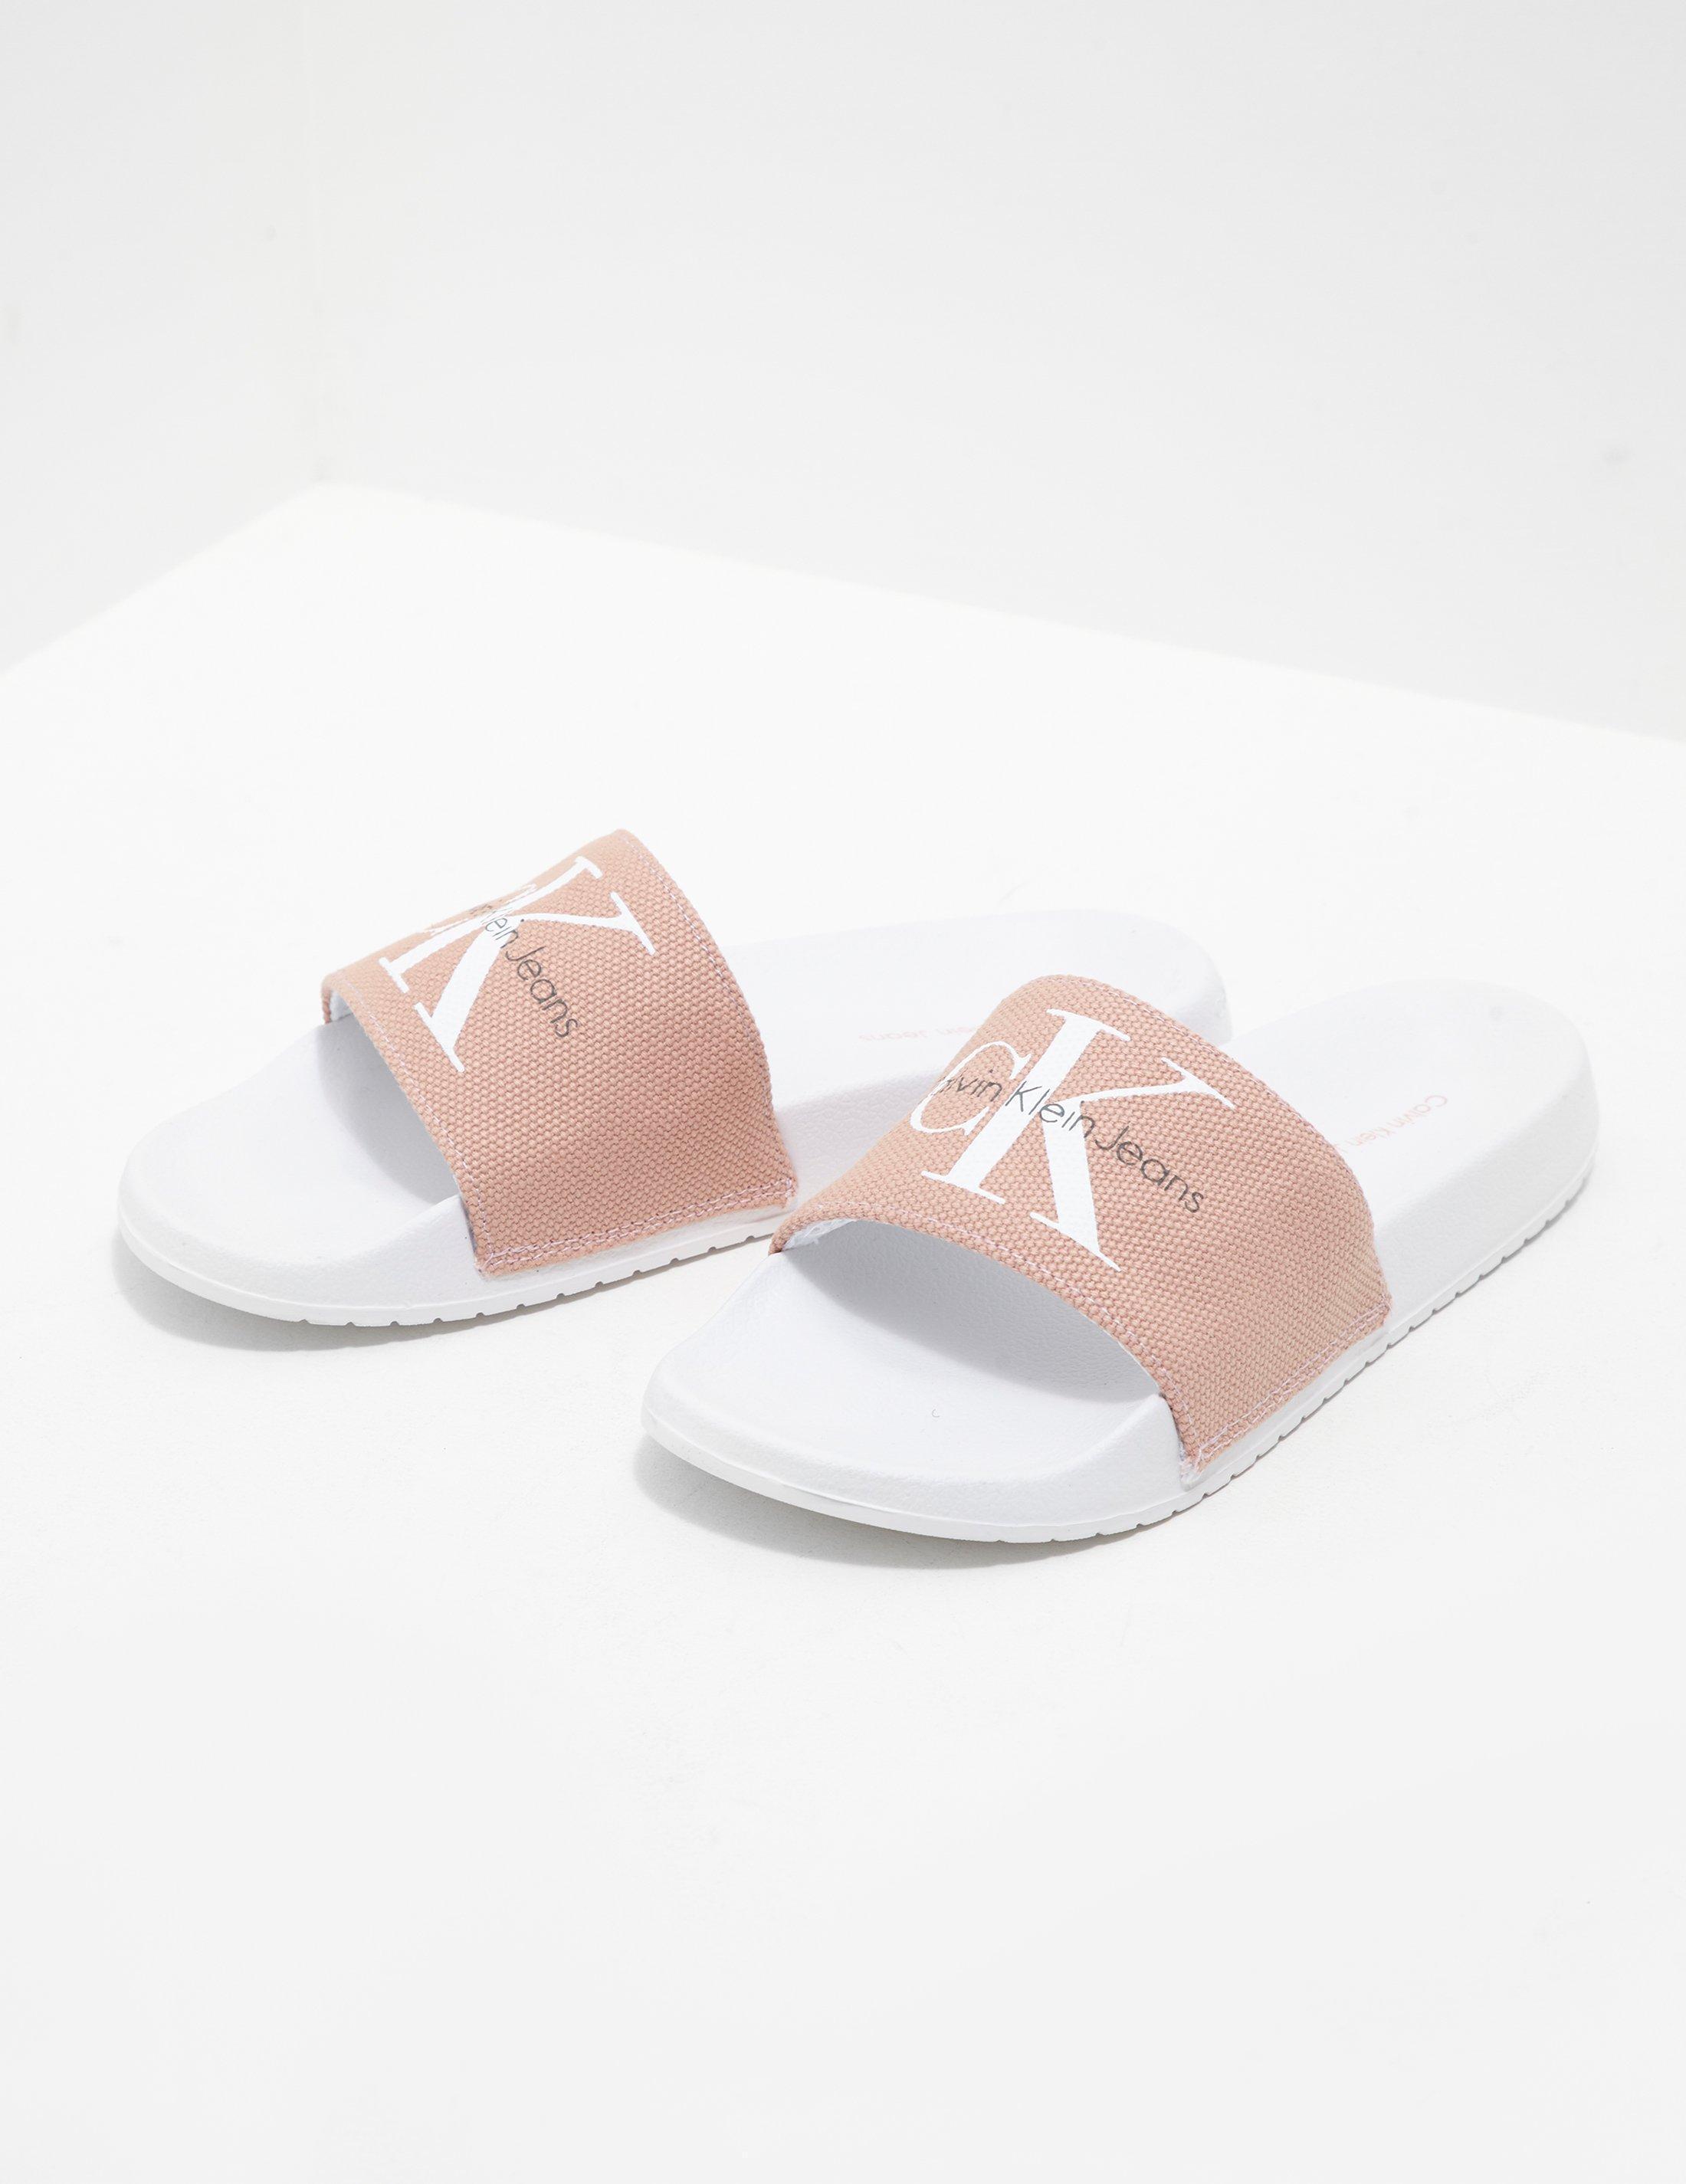 Calvin Klein Womens Chantal Slides Pink